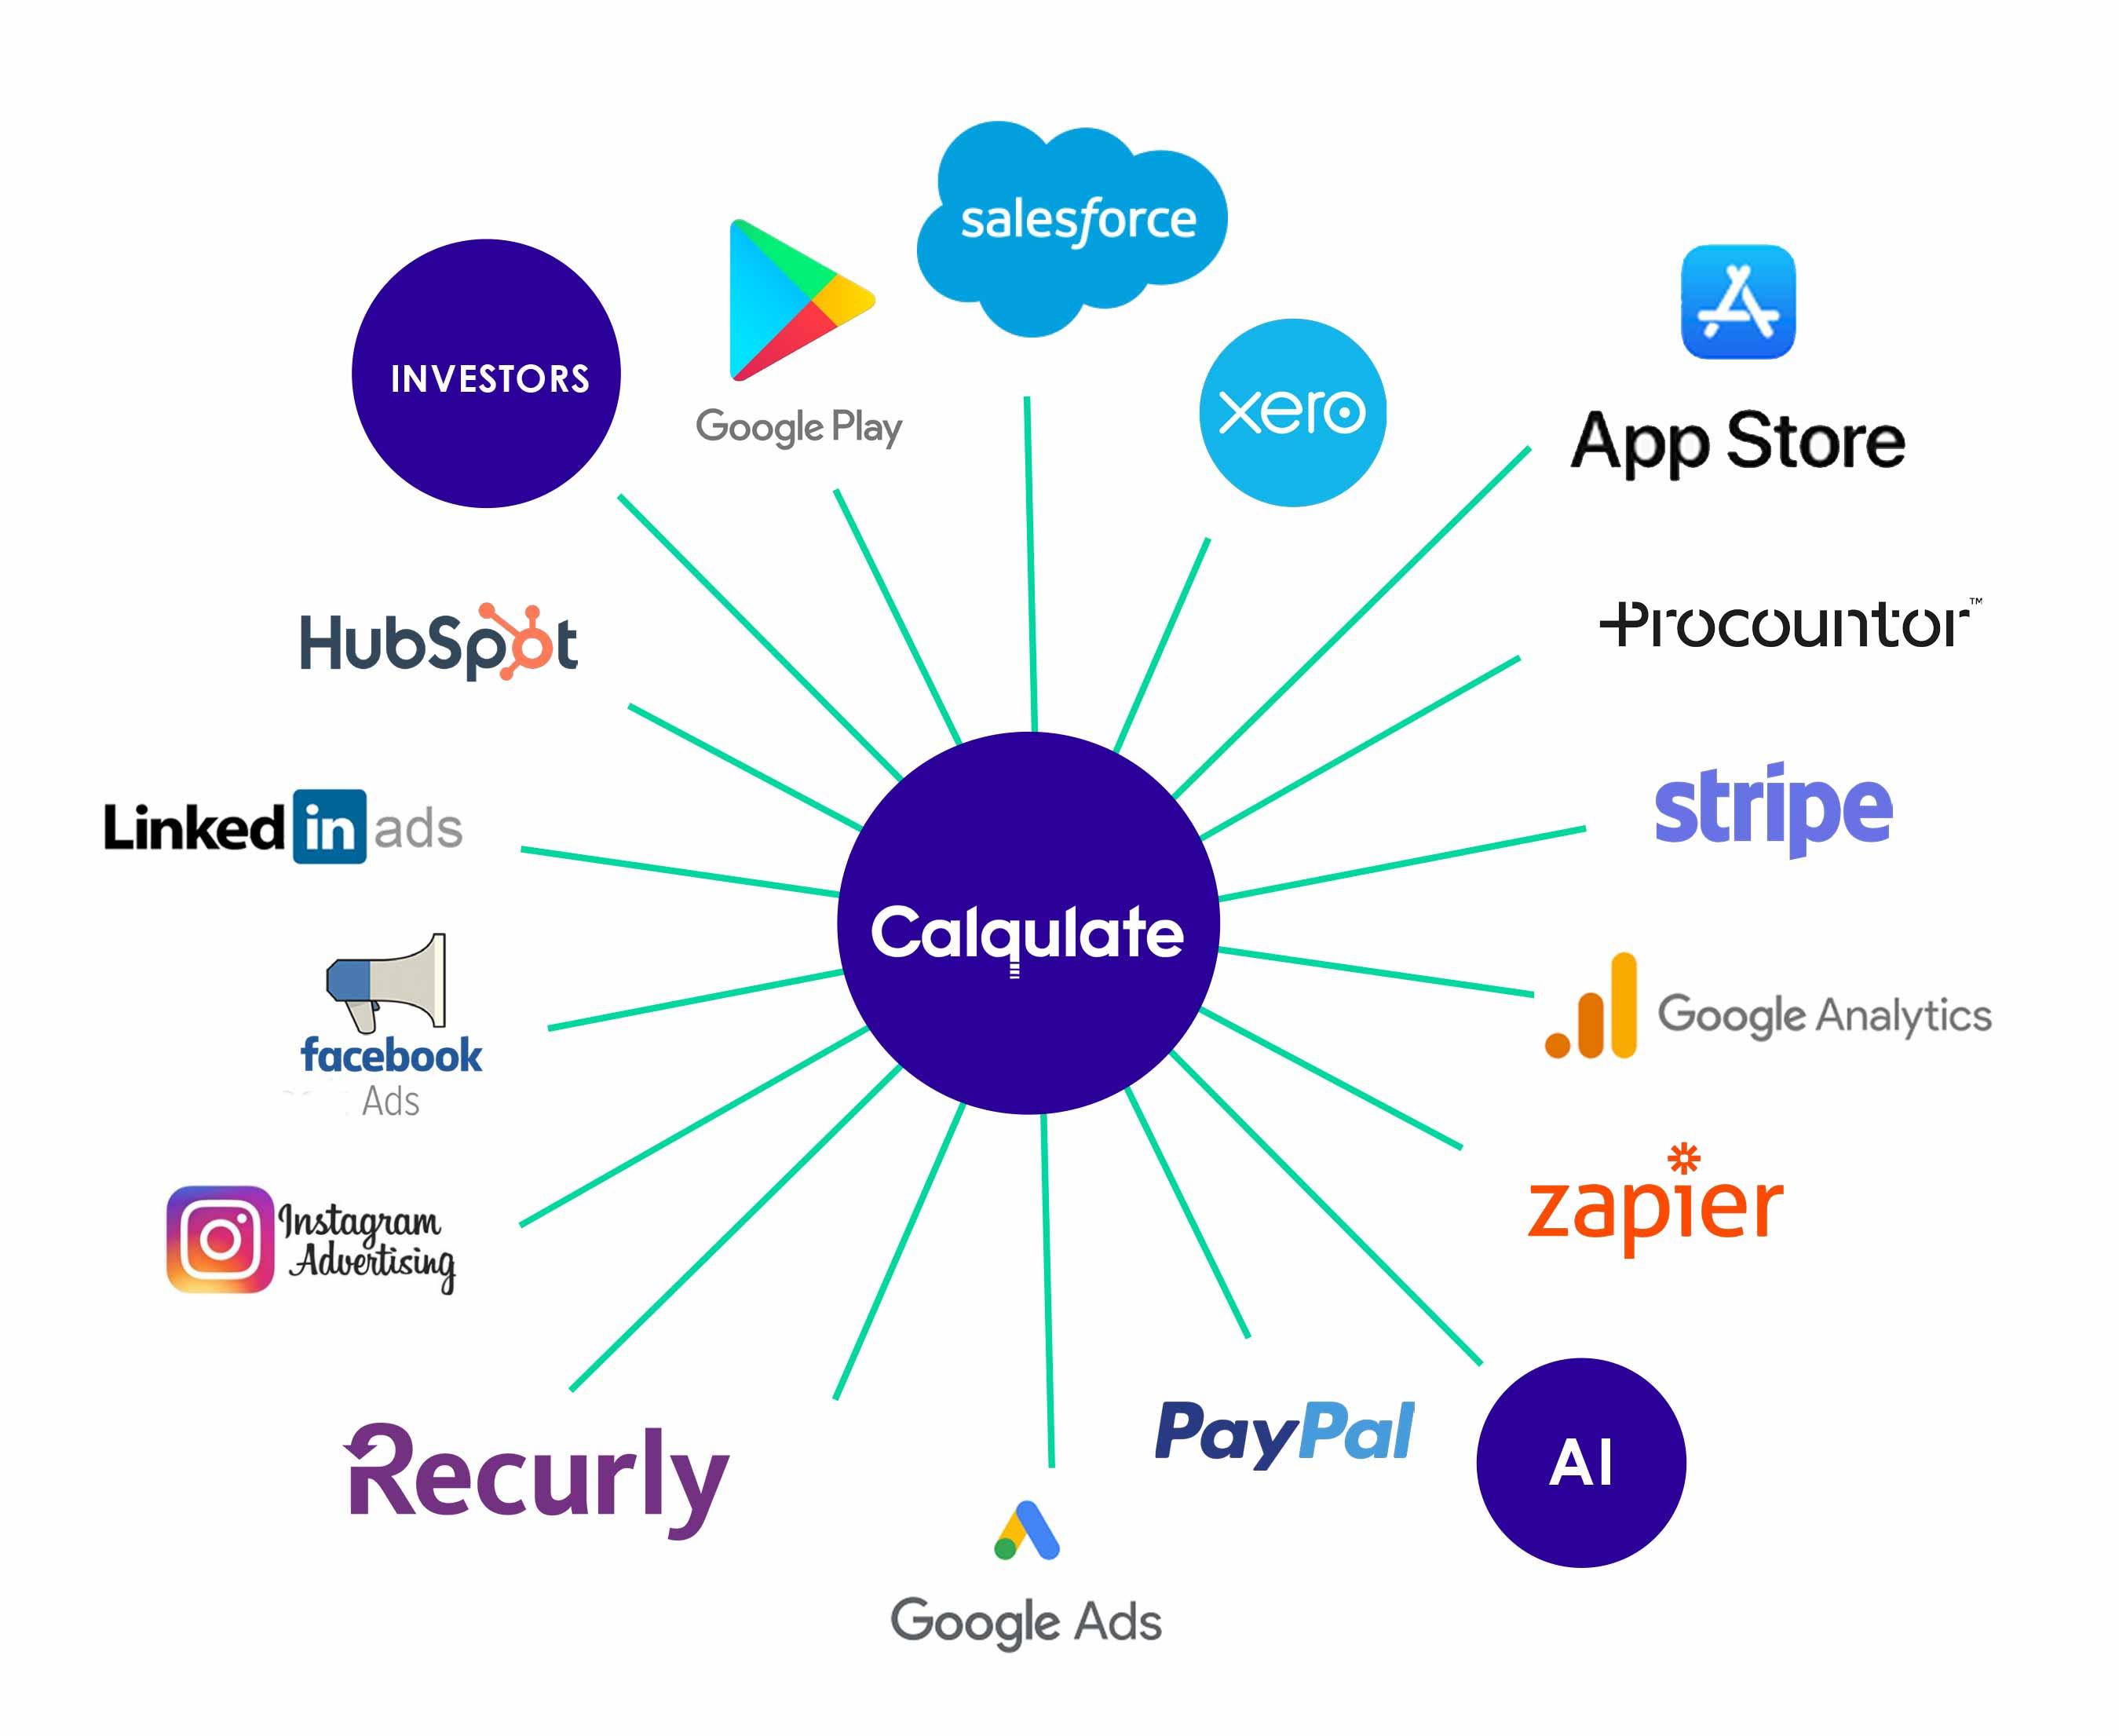 Calqulate_integrations-2